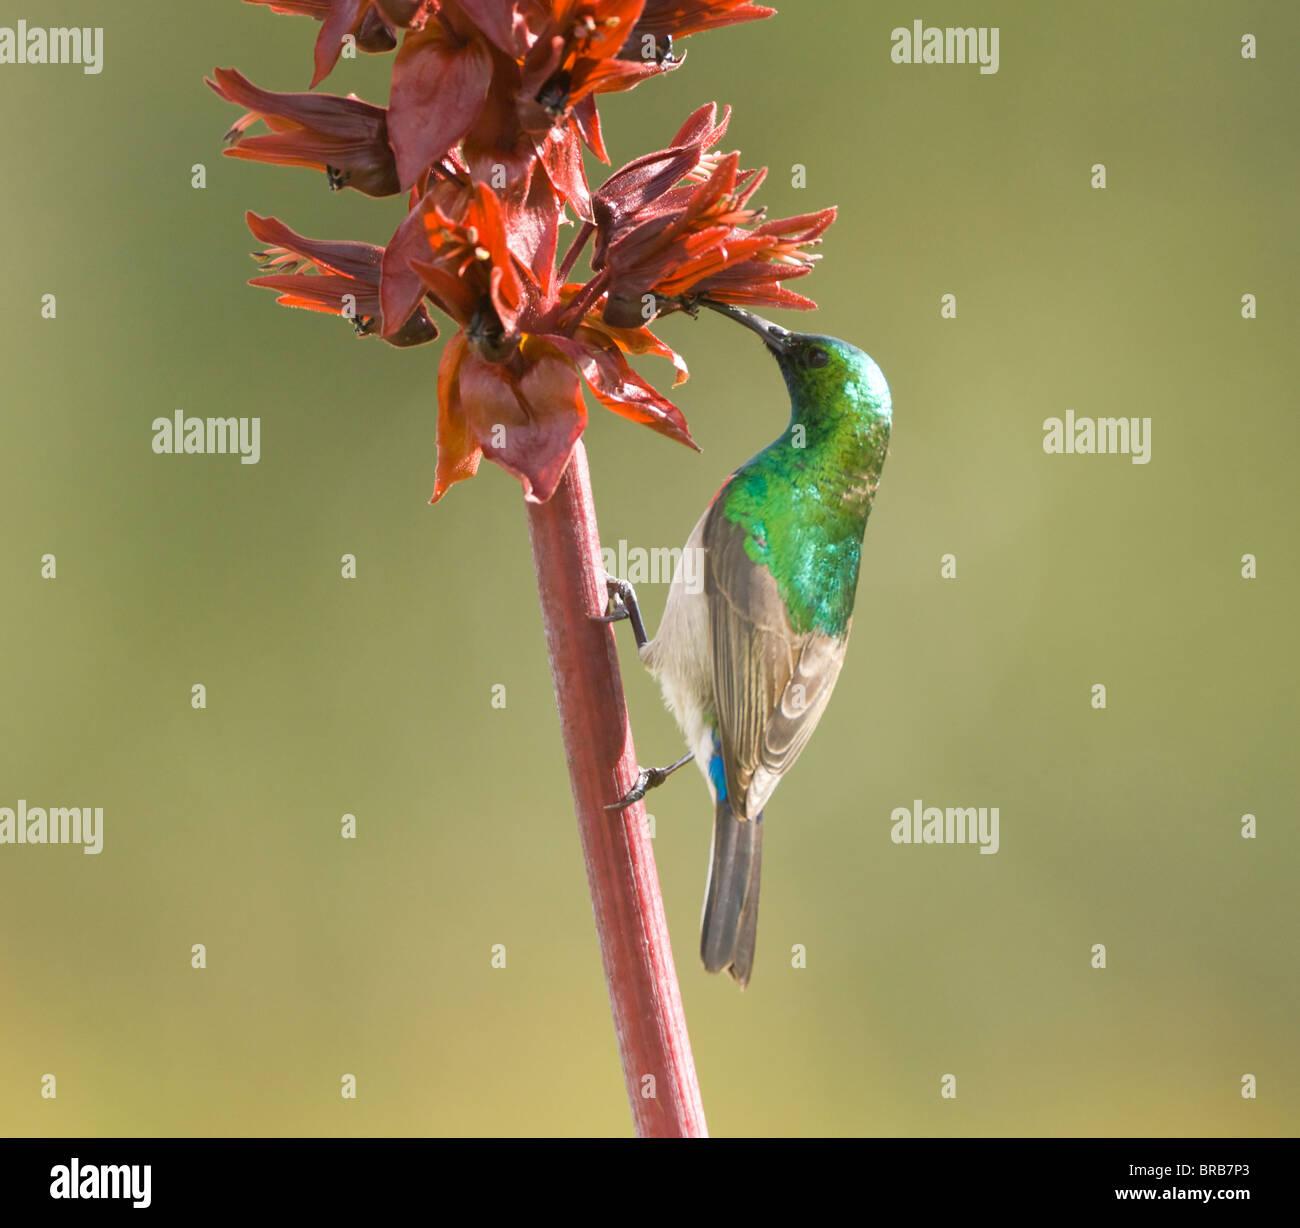 Southern Lesser Double-Collared Sunbird Cinnyris chalybea Cape Town Kirstenbosch Botanical Gardens South Africa - Stock Image